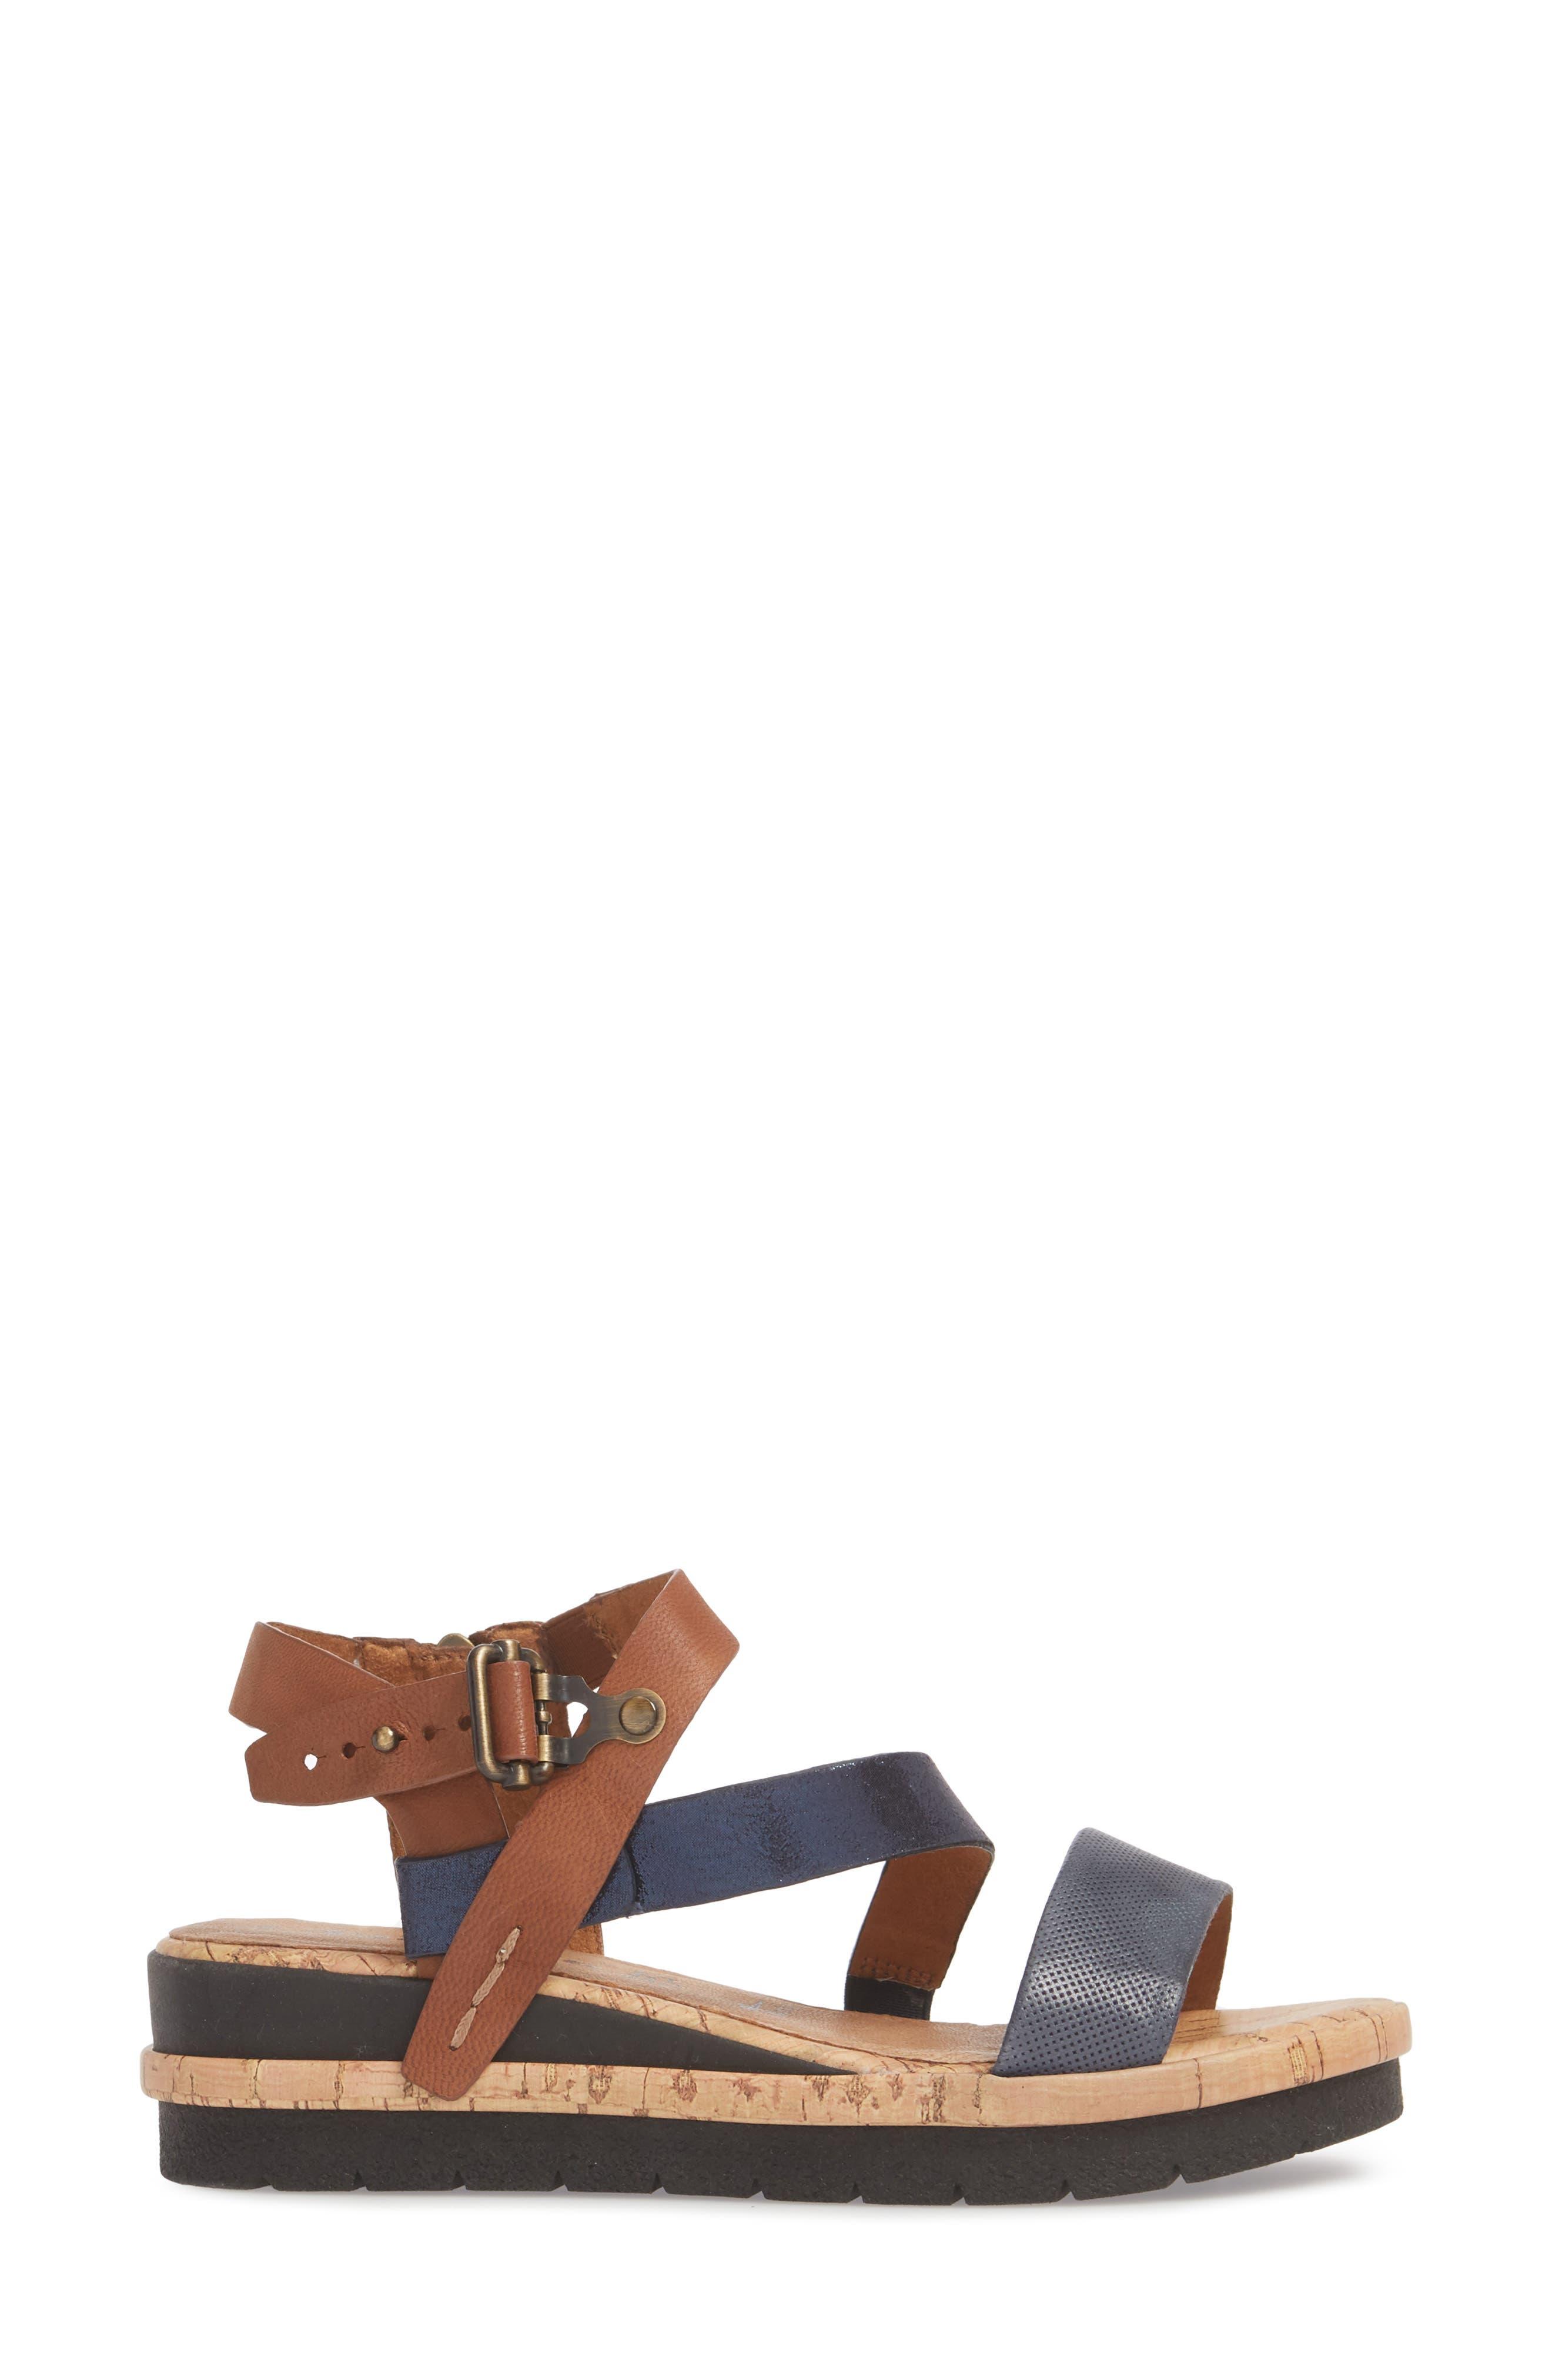 Eda Diagonal Strap Wedge Sandal,                             Alternate thumbnail 3, color,                             Navy/ Cognac Leather